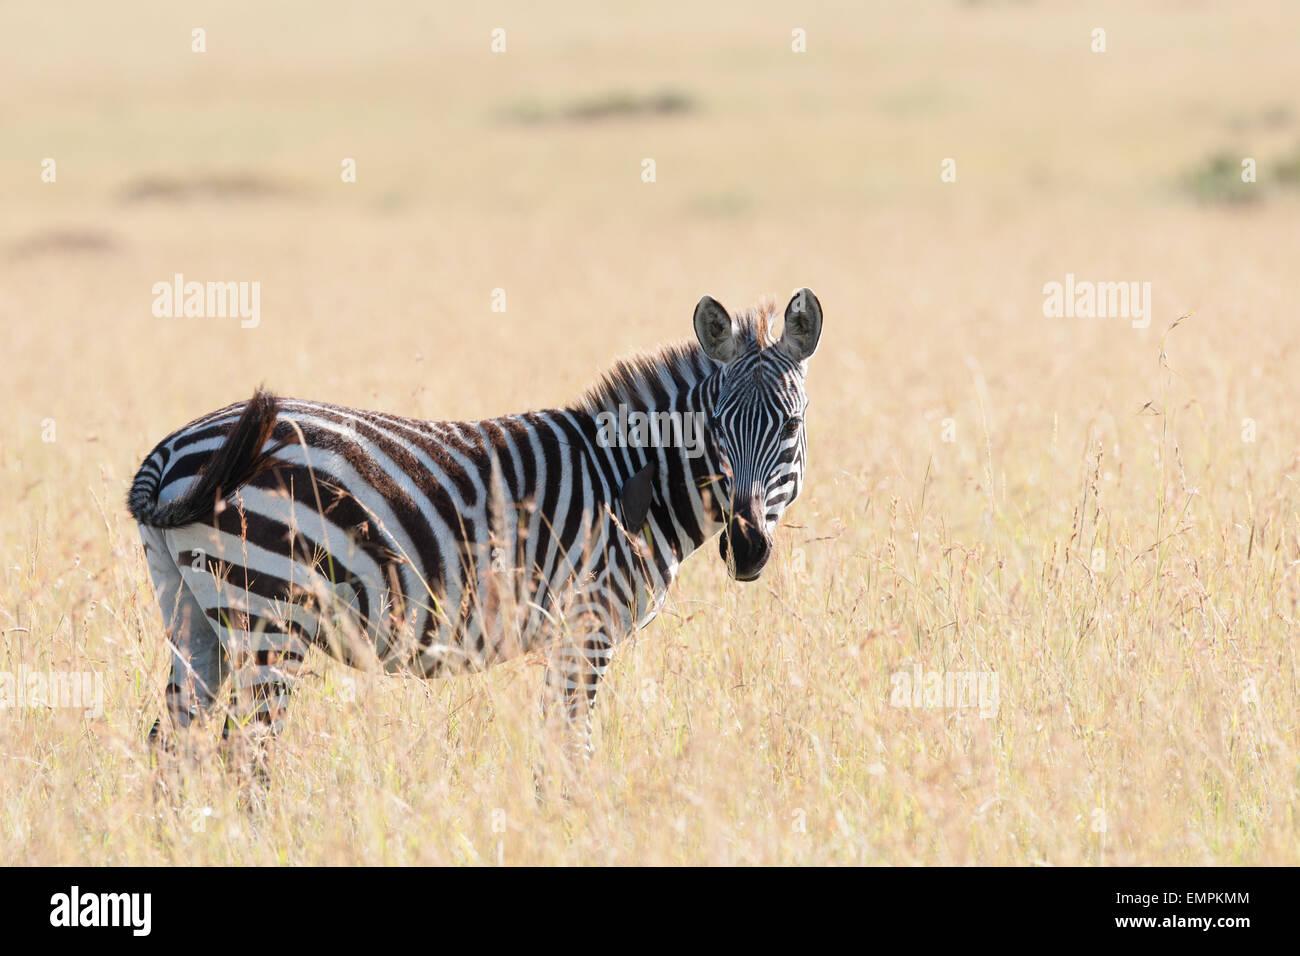 Zebra nella savana del Kenya Immagini Stock